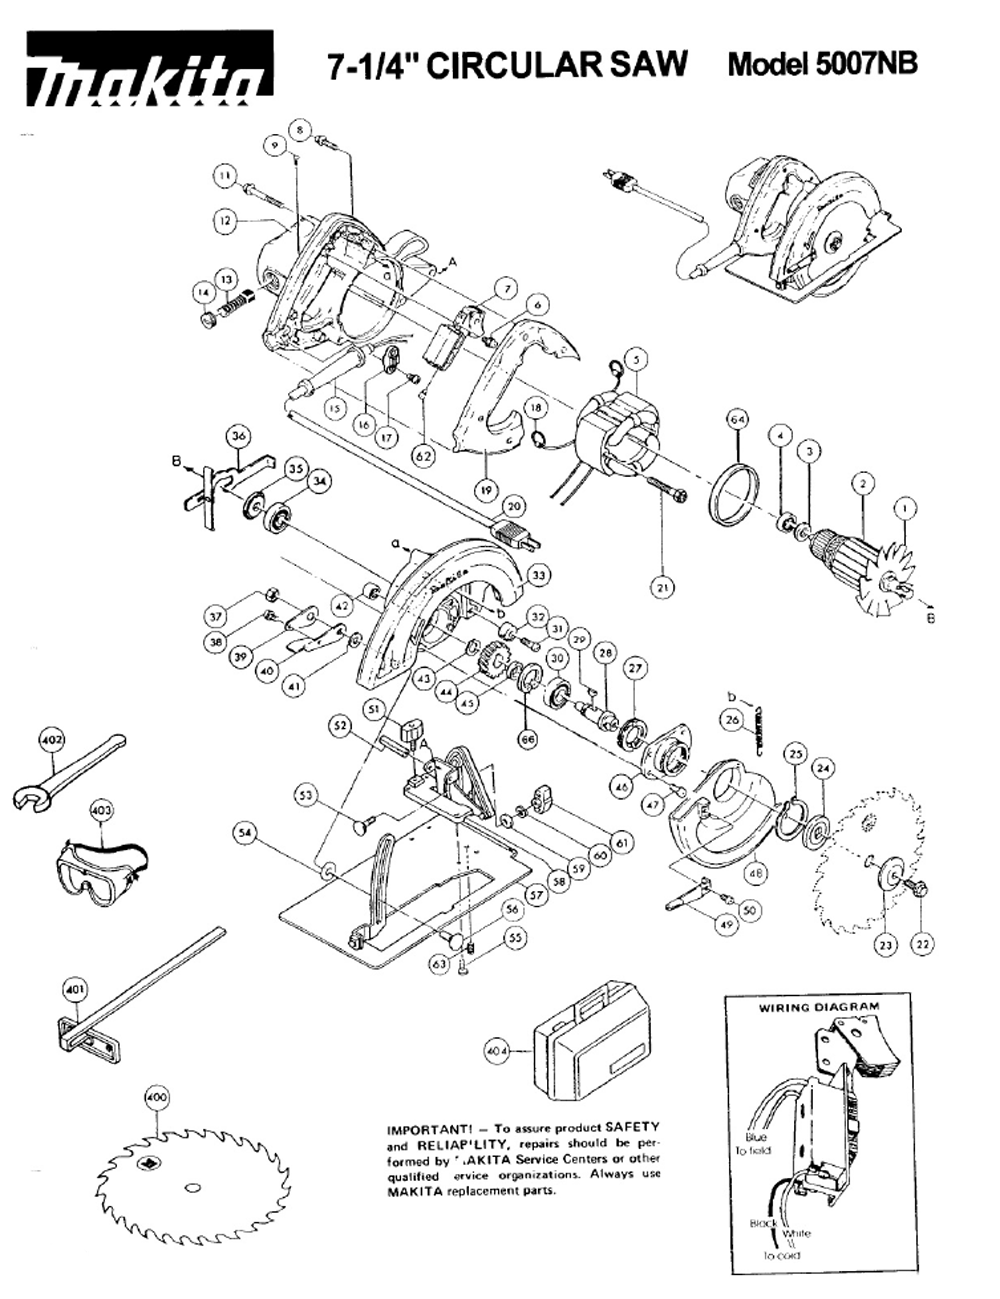 pin by brant powell on tech illustrations electric saw makita tools makita 9227c wiring diagram makita wiring diagram [ 1000 x 1299 Pixel ]